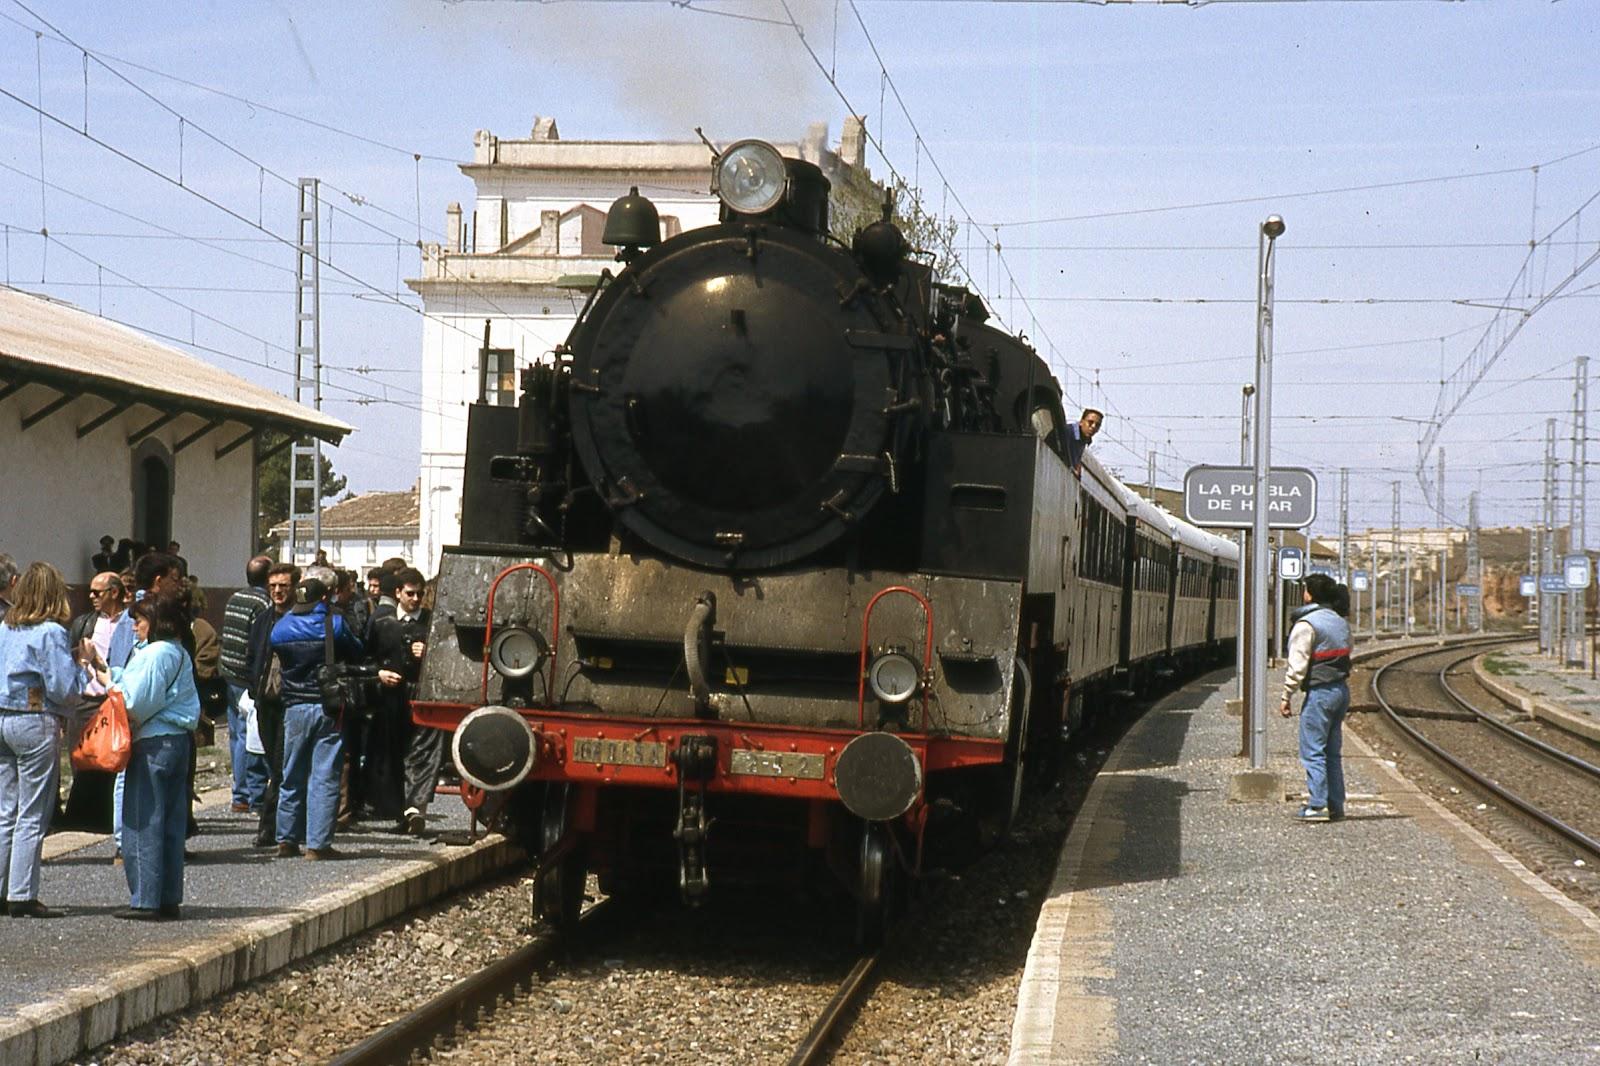 +++Puebla de Hijar 1992, tren del tambor-Olaizola